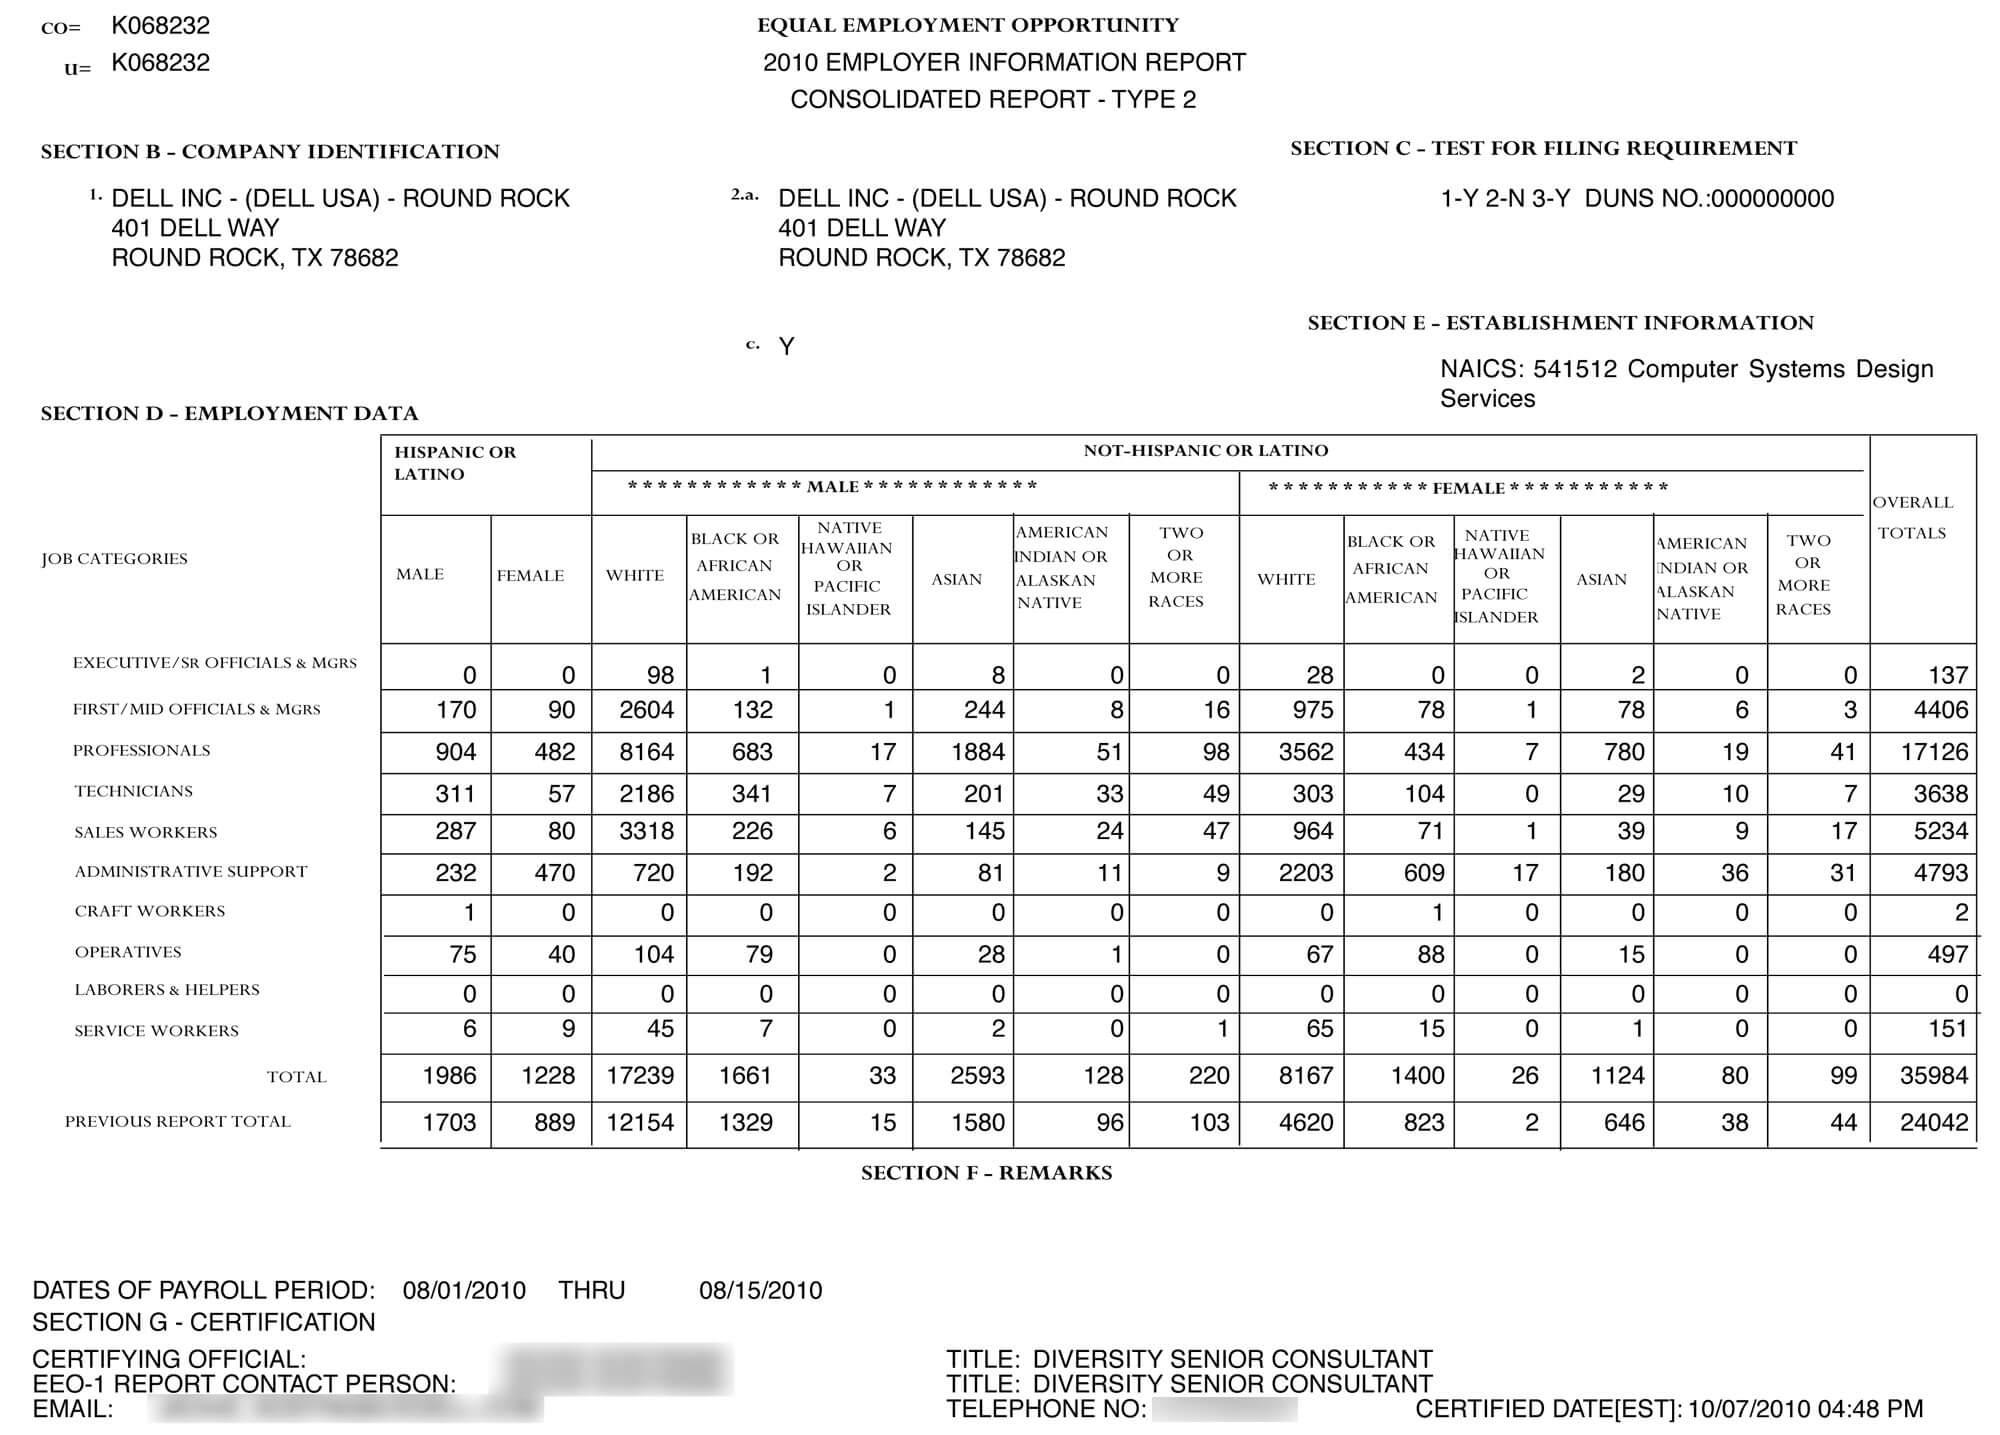 Sample Form Eeo 1 | Word Online Template Cv (Resume) For Eeo 1 Report Template